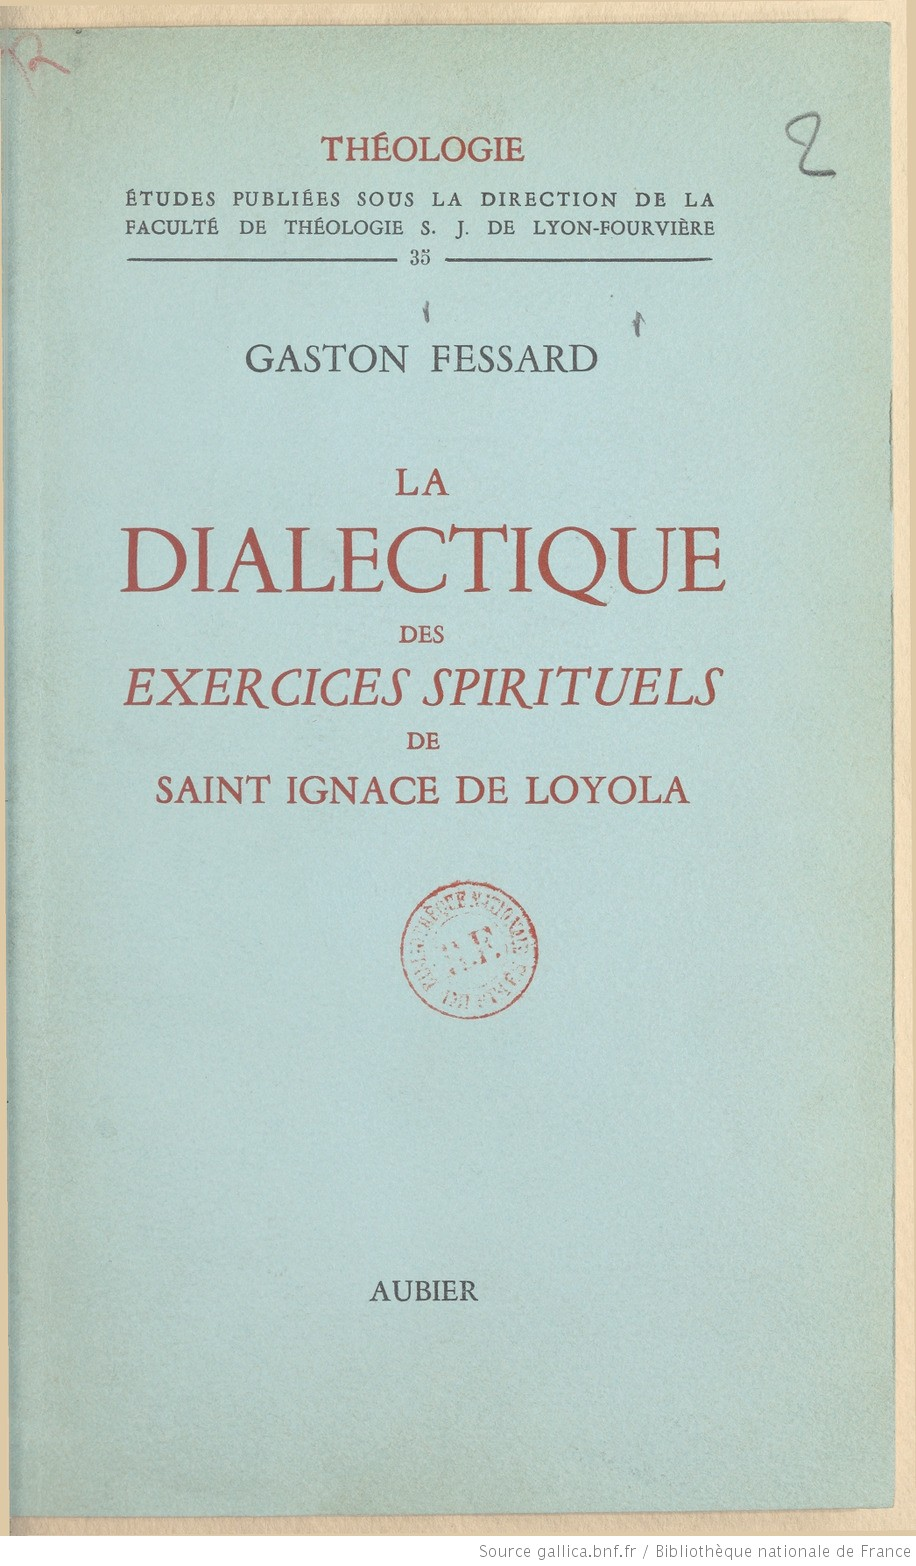 Exercices Spirituels De Saint Ignace De Loyola Texte